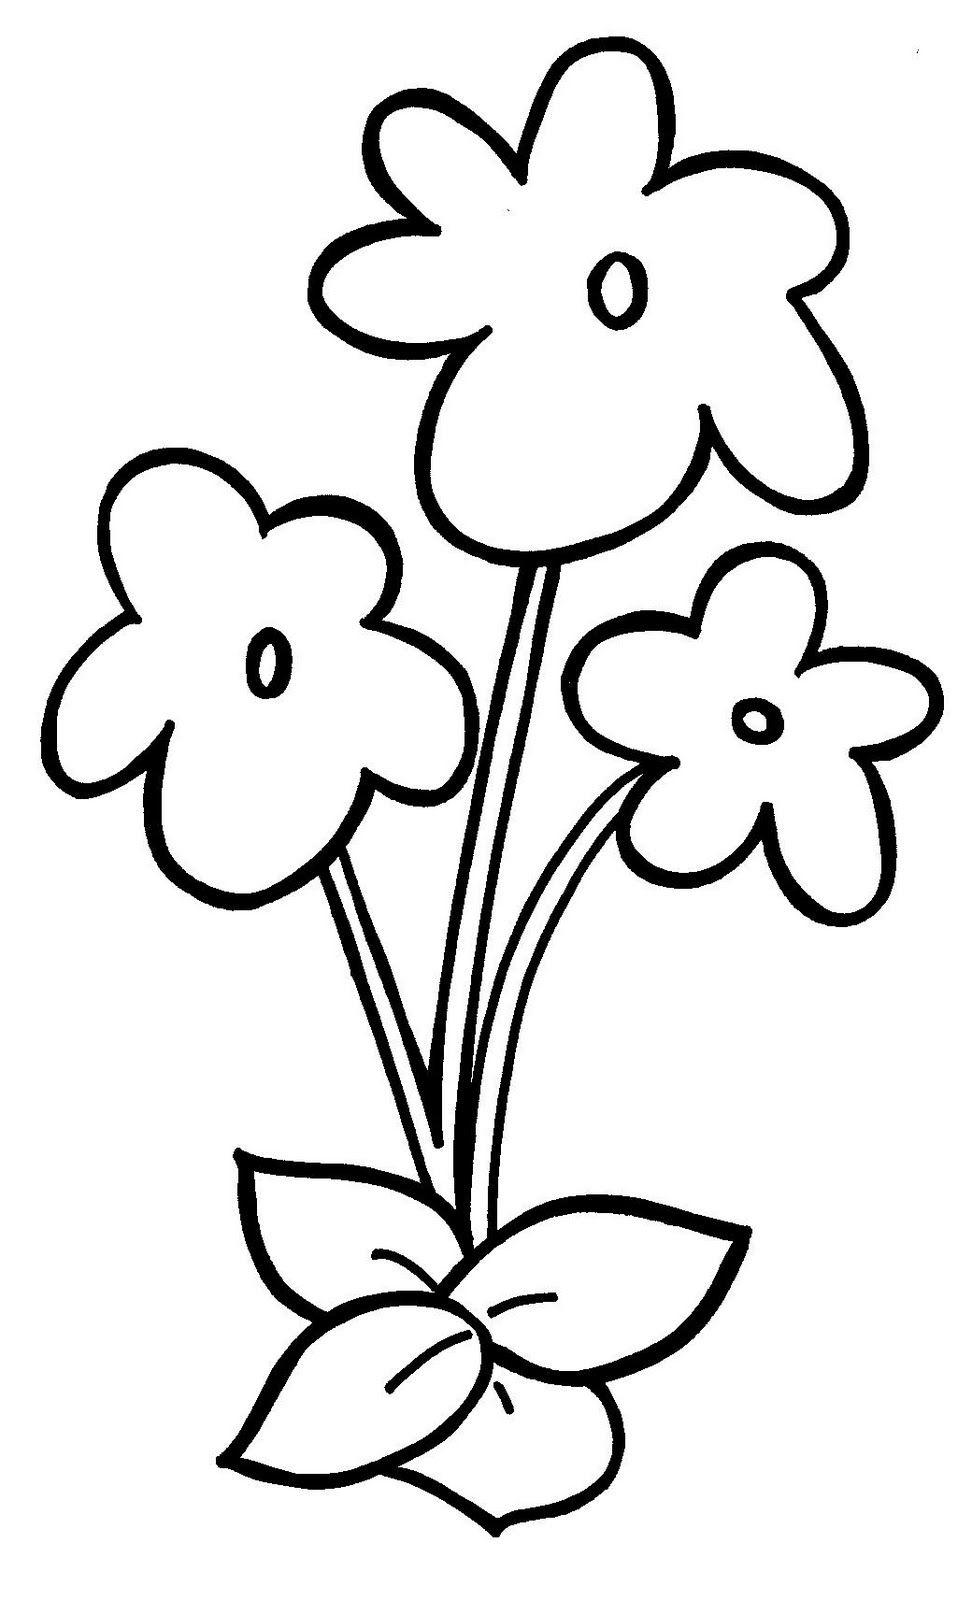 free printable preschool flower coloring pages print out valentine39s day flower coloring pages free printable free pages coloring preschool flower